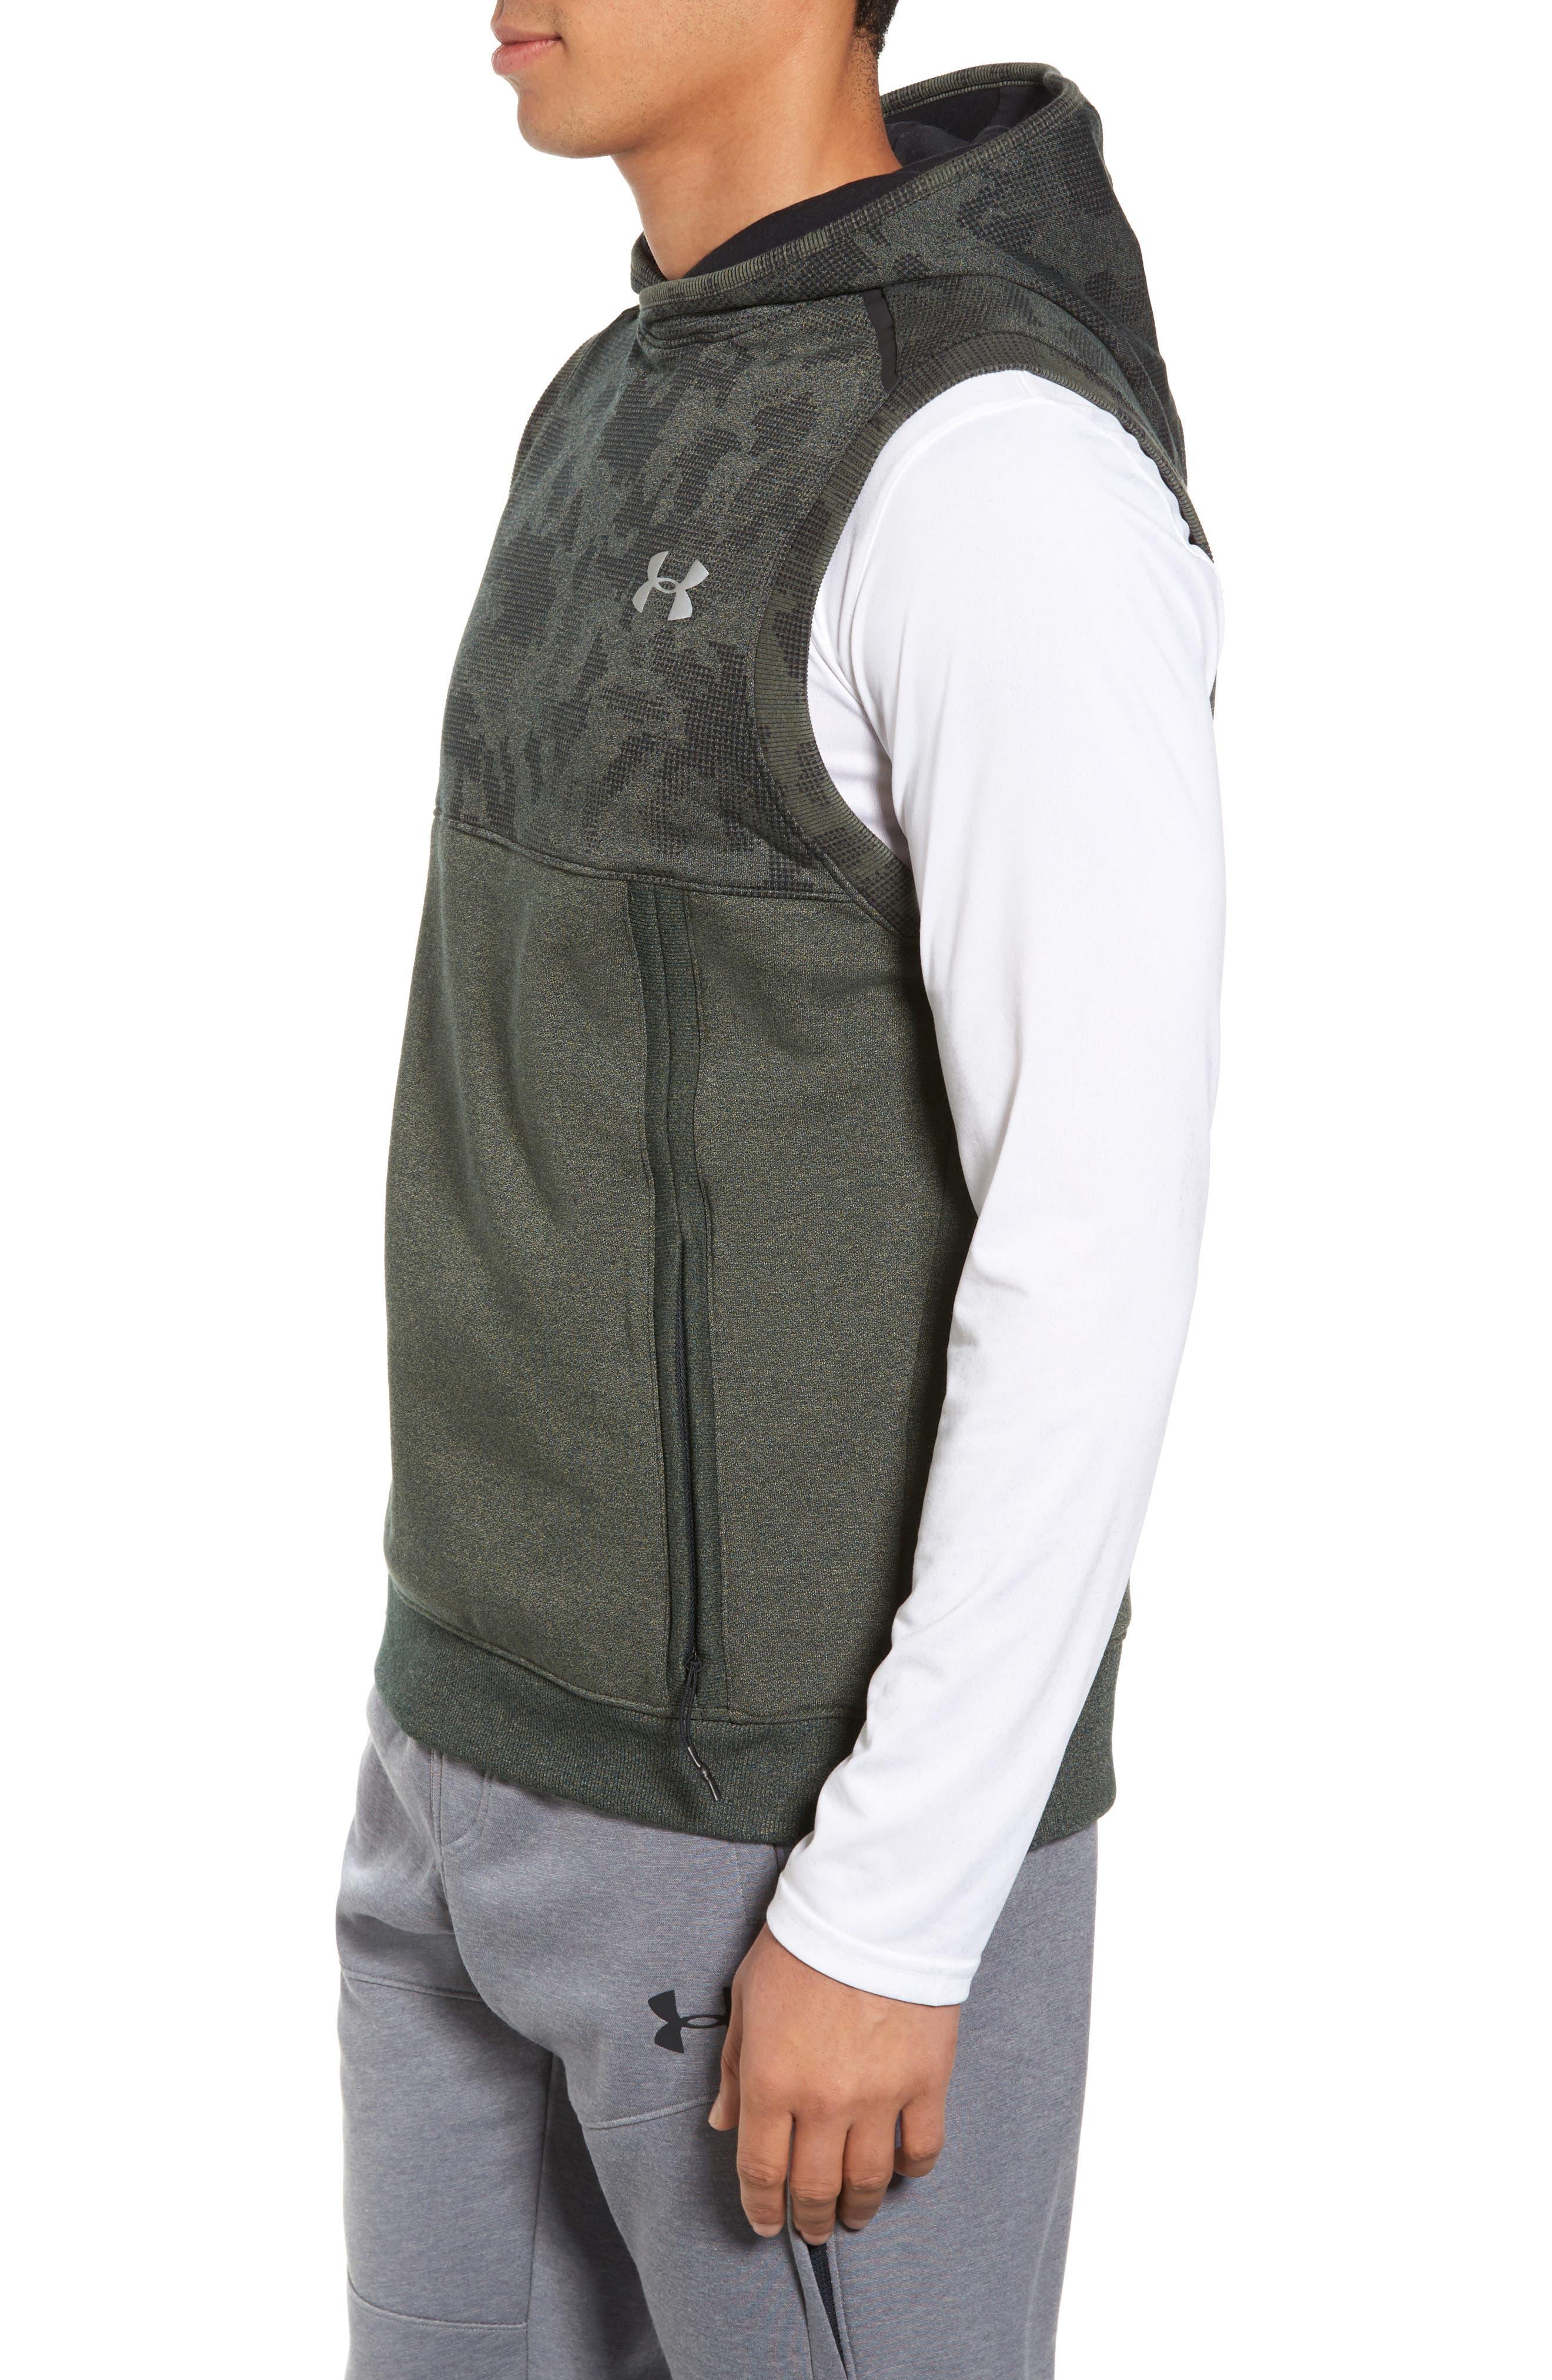 Threadborne Hooded Vest,                             Alternate thumbnail 3, color,                             Downtown Green / Refletive